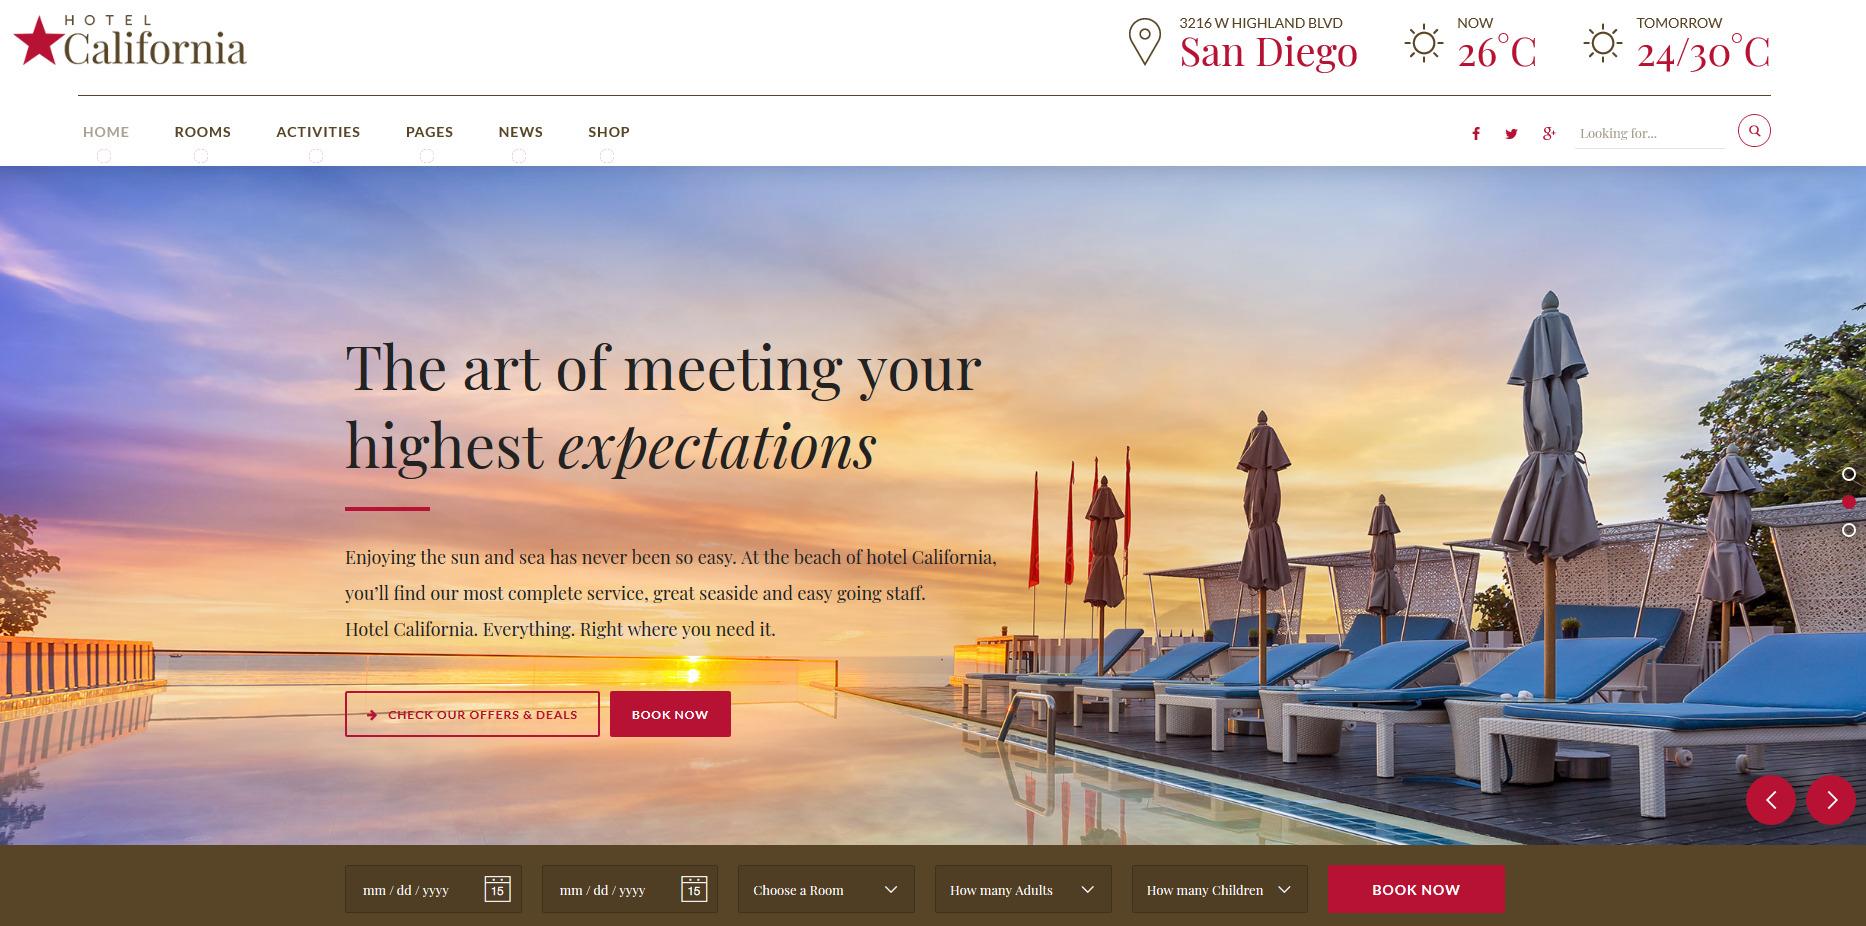 hotel california wp theme